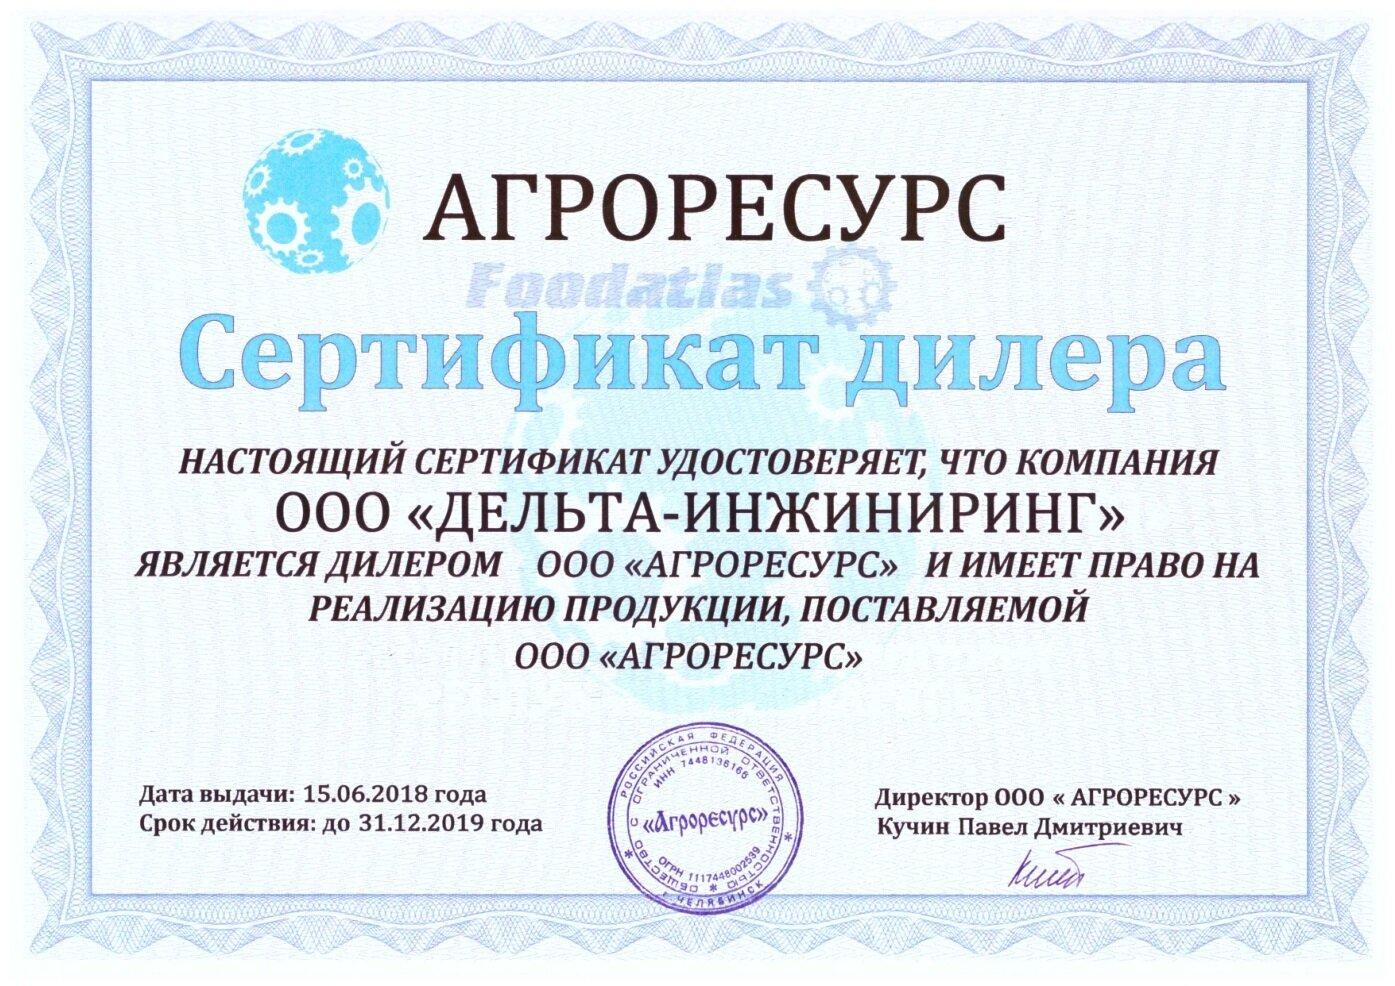 Сертификаты - фото pic_c003f1ba5b4263ae41b4c9f4b73d7b71_1920x9000_1.jpg